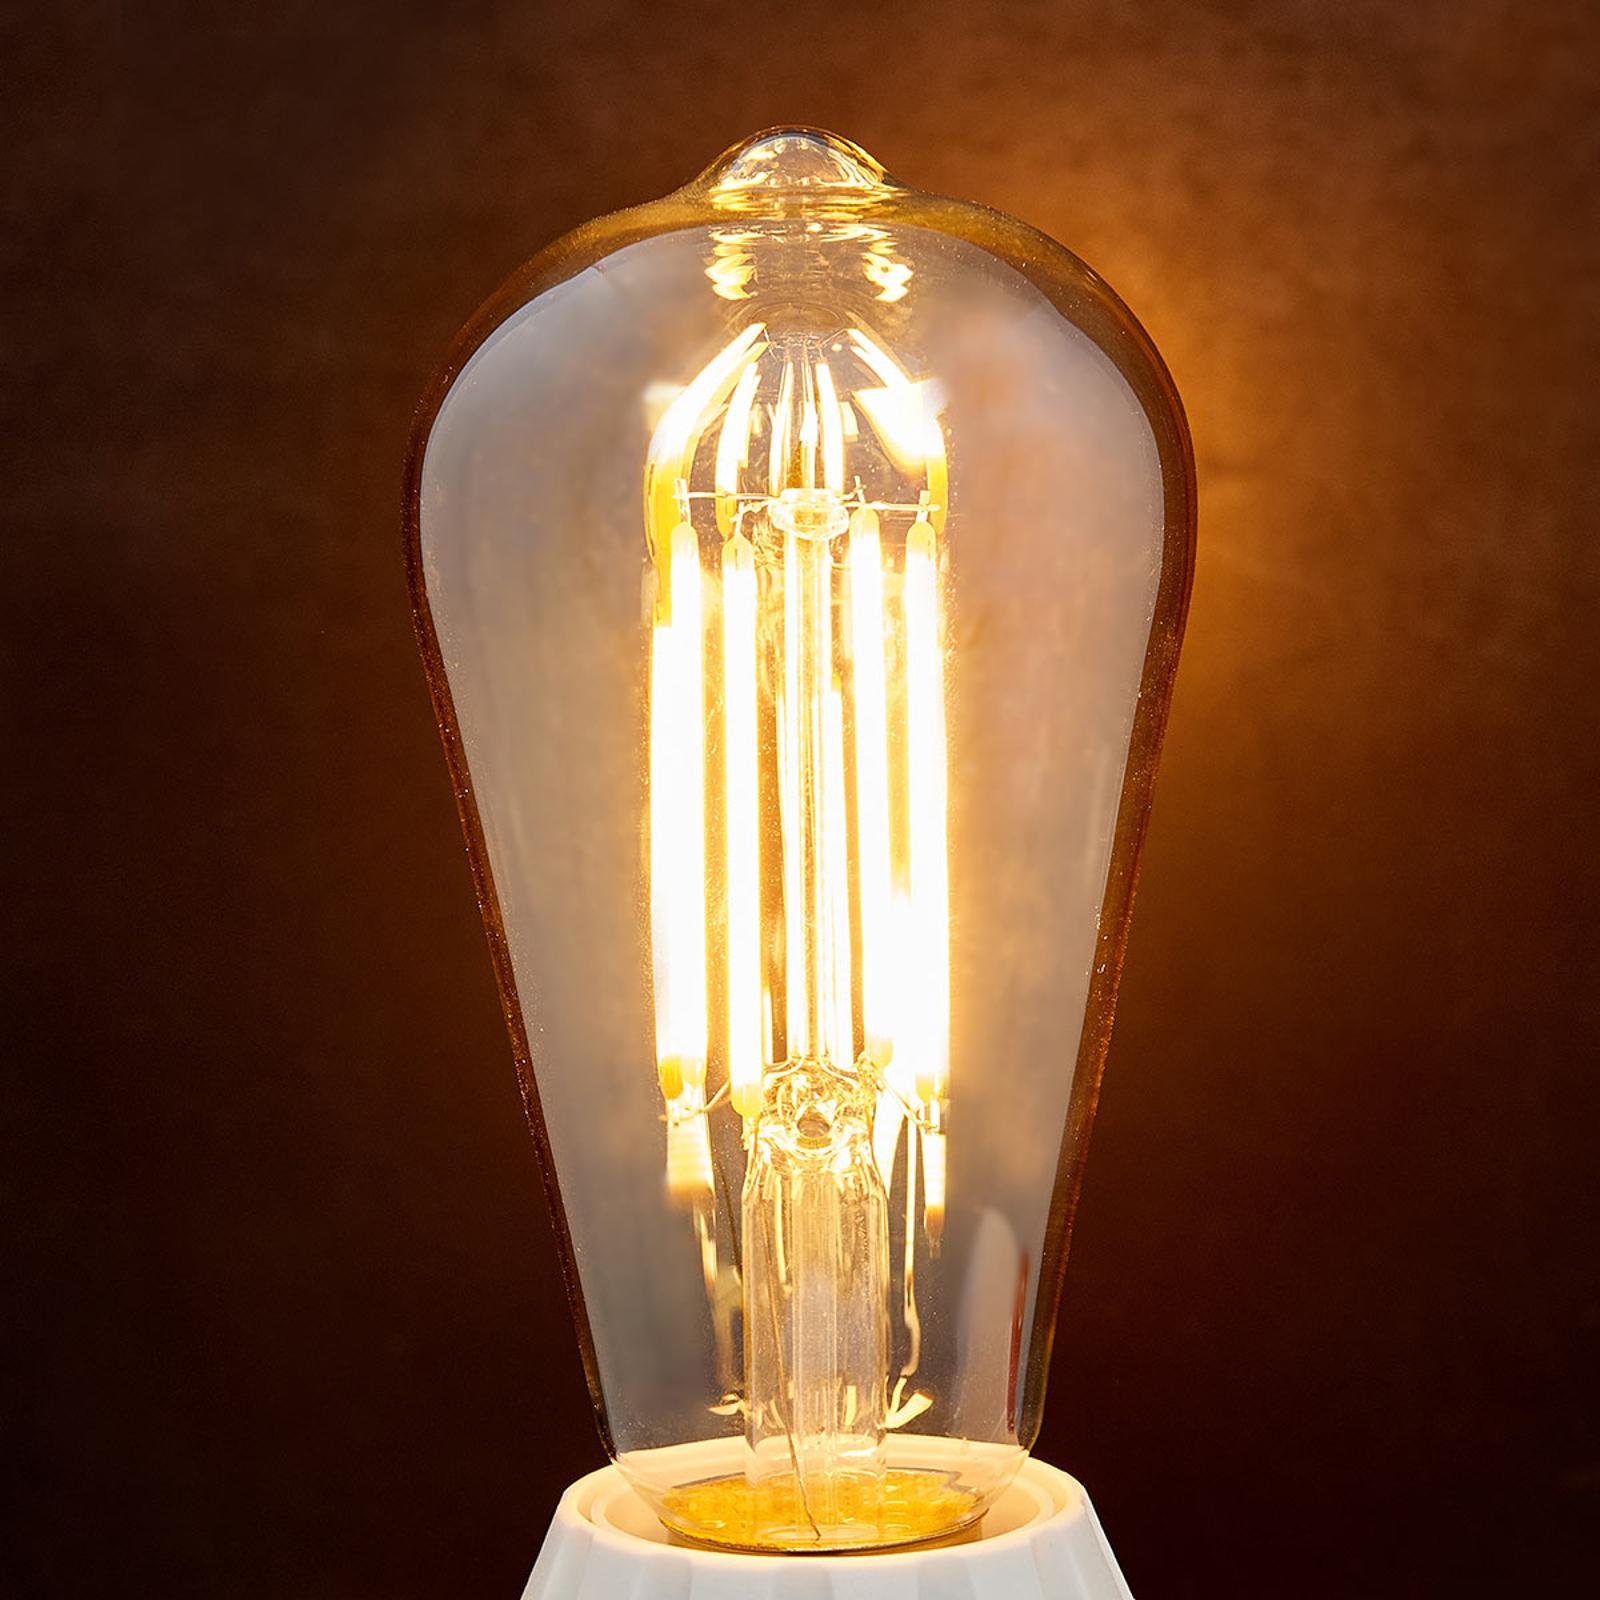 E27 LED-rustikk lyspære 6W 500 lm, rav 2200K